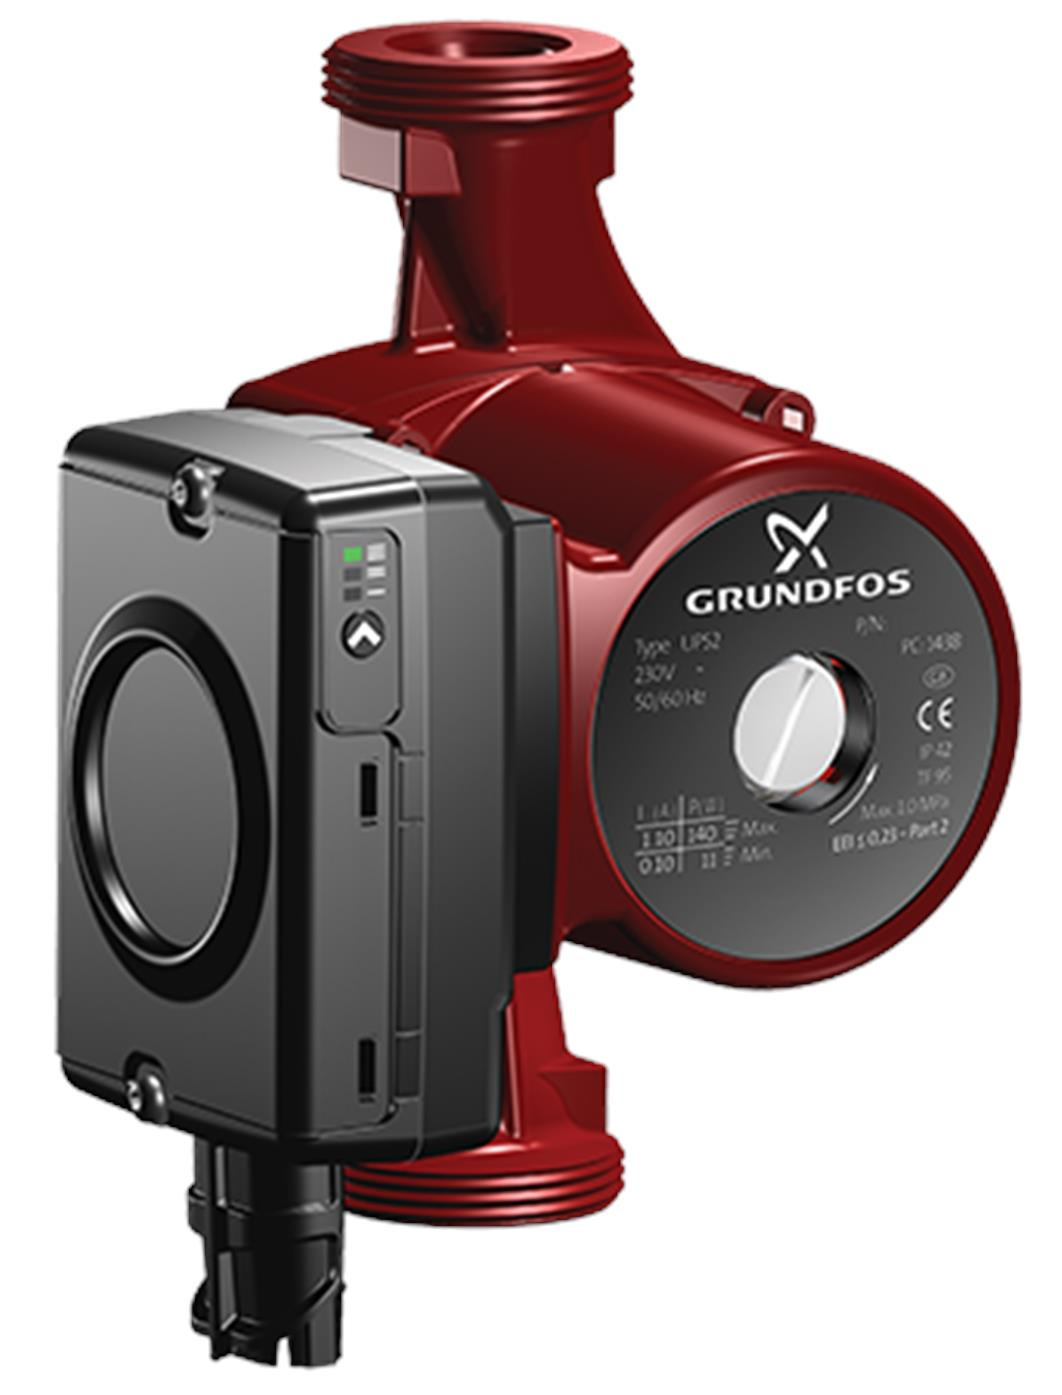 Grundfos UPS2 Basic Domestic Circulator Pumps